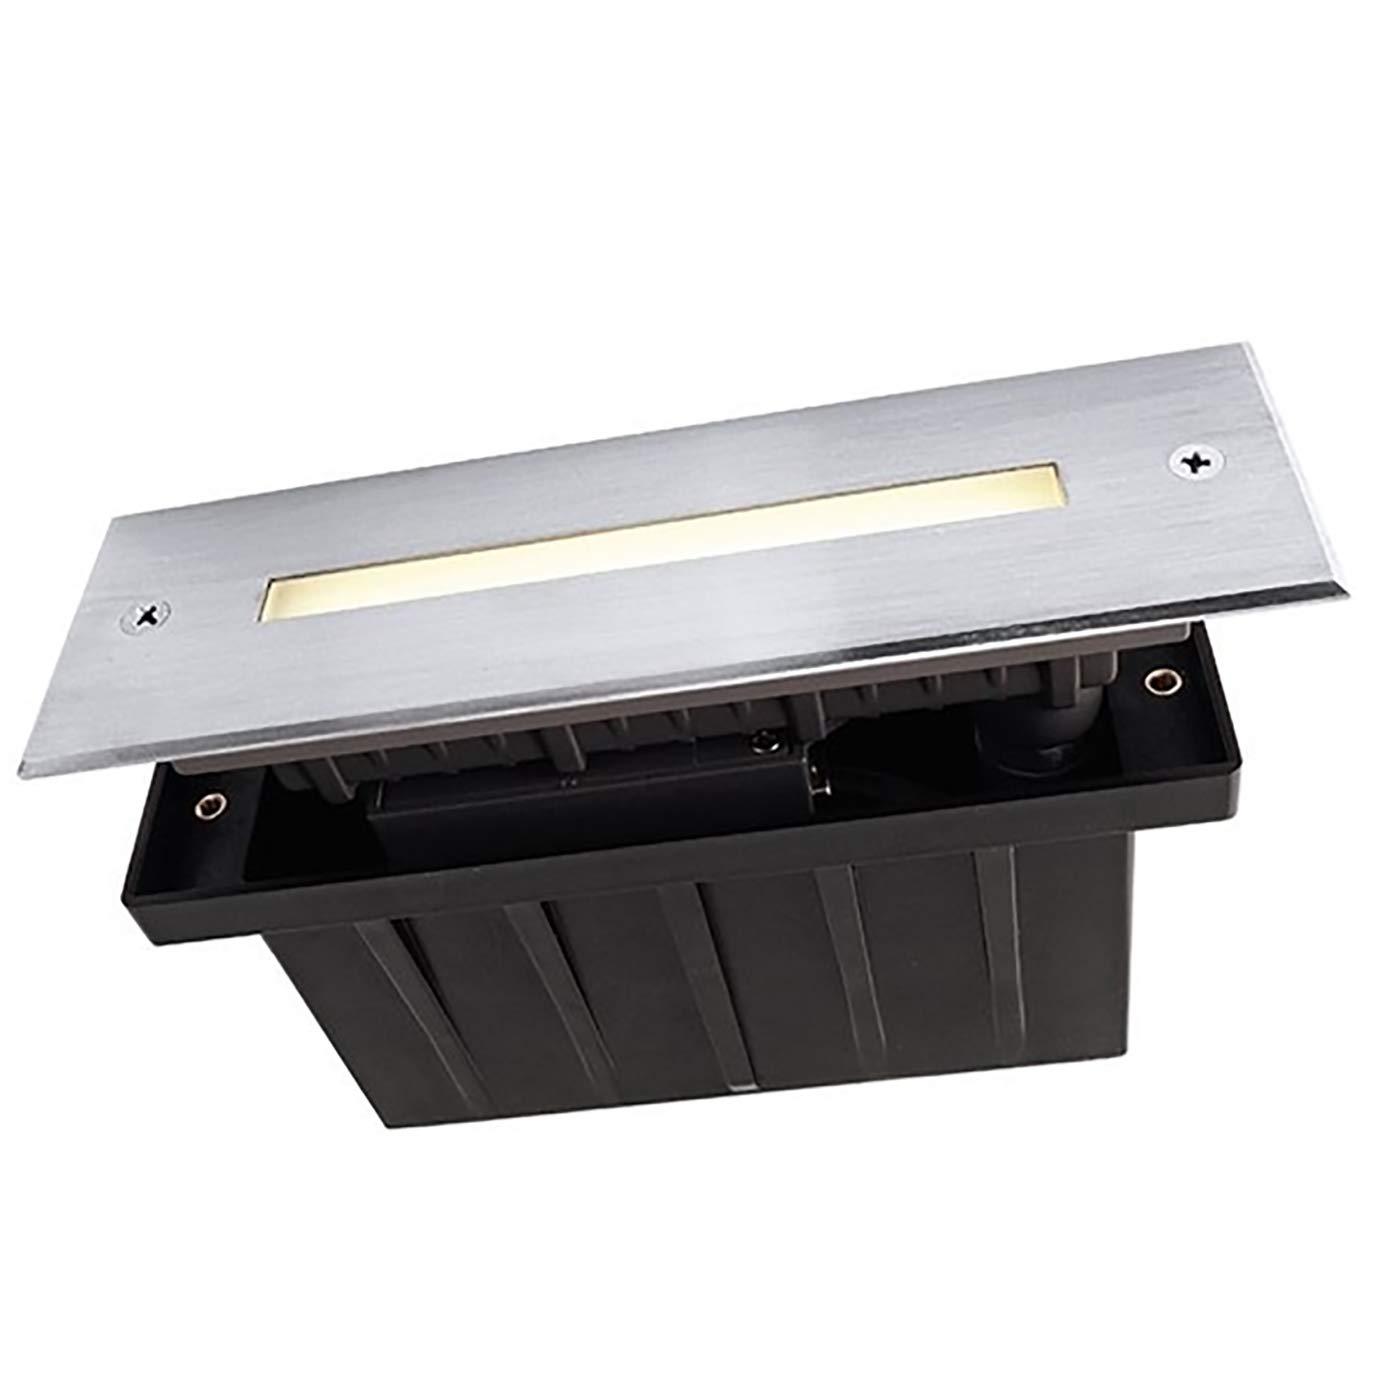 Faretto calpestabile IP67 rettangolare incasso 10 led 2w luce calda 3000K 230V